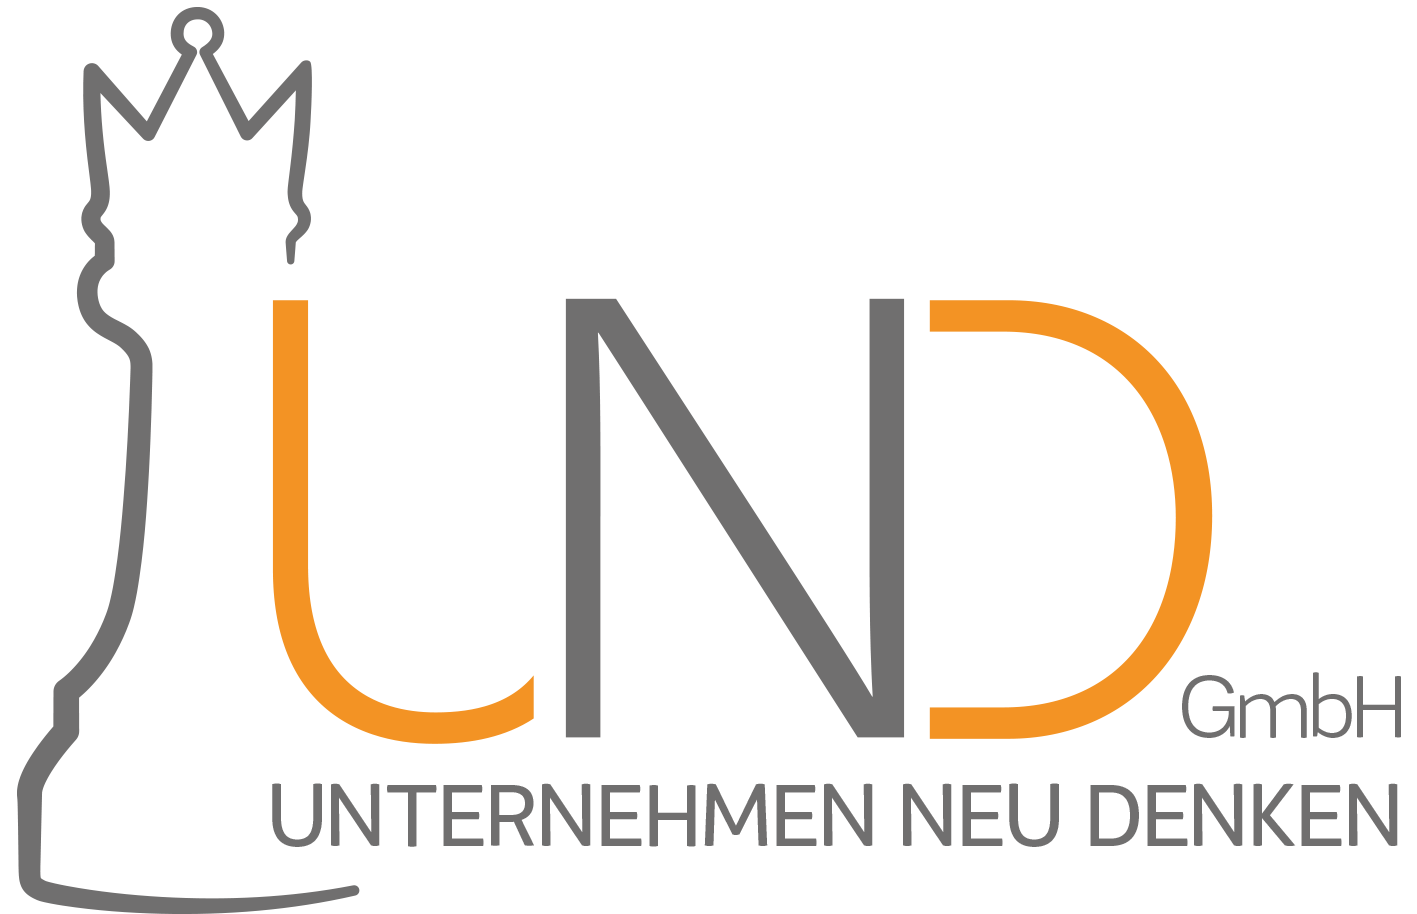 U.N.D. GmbH